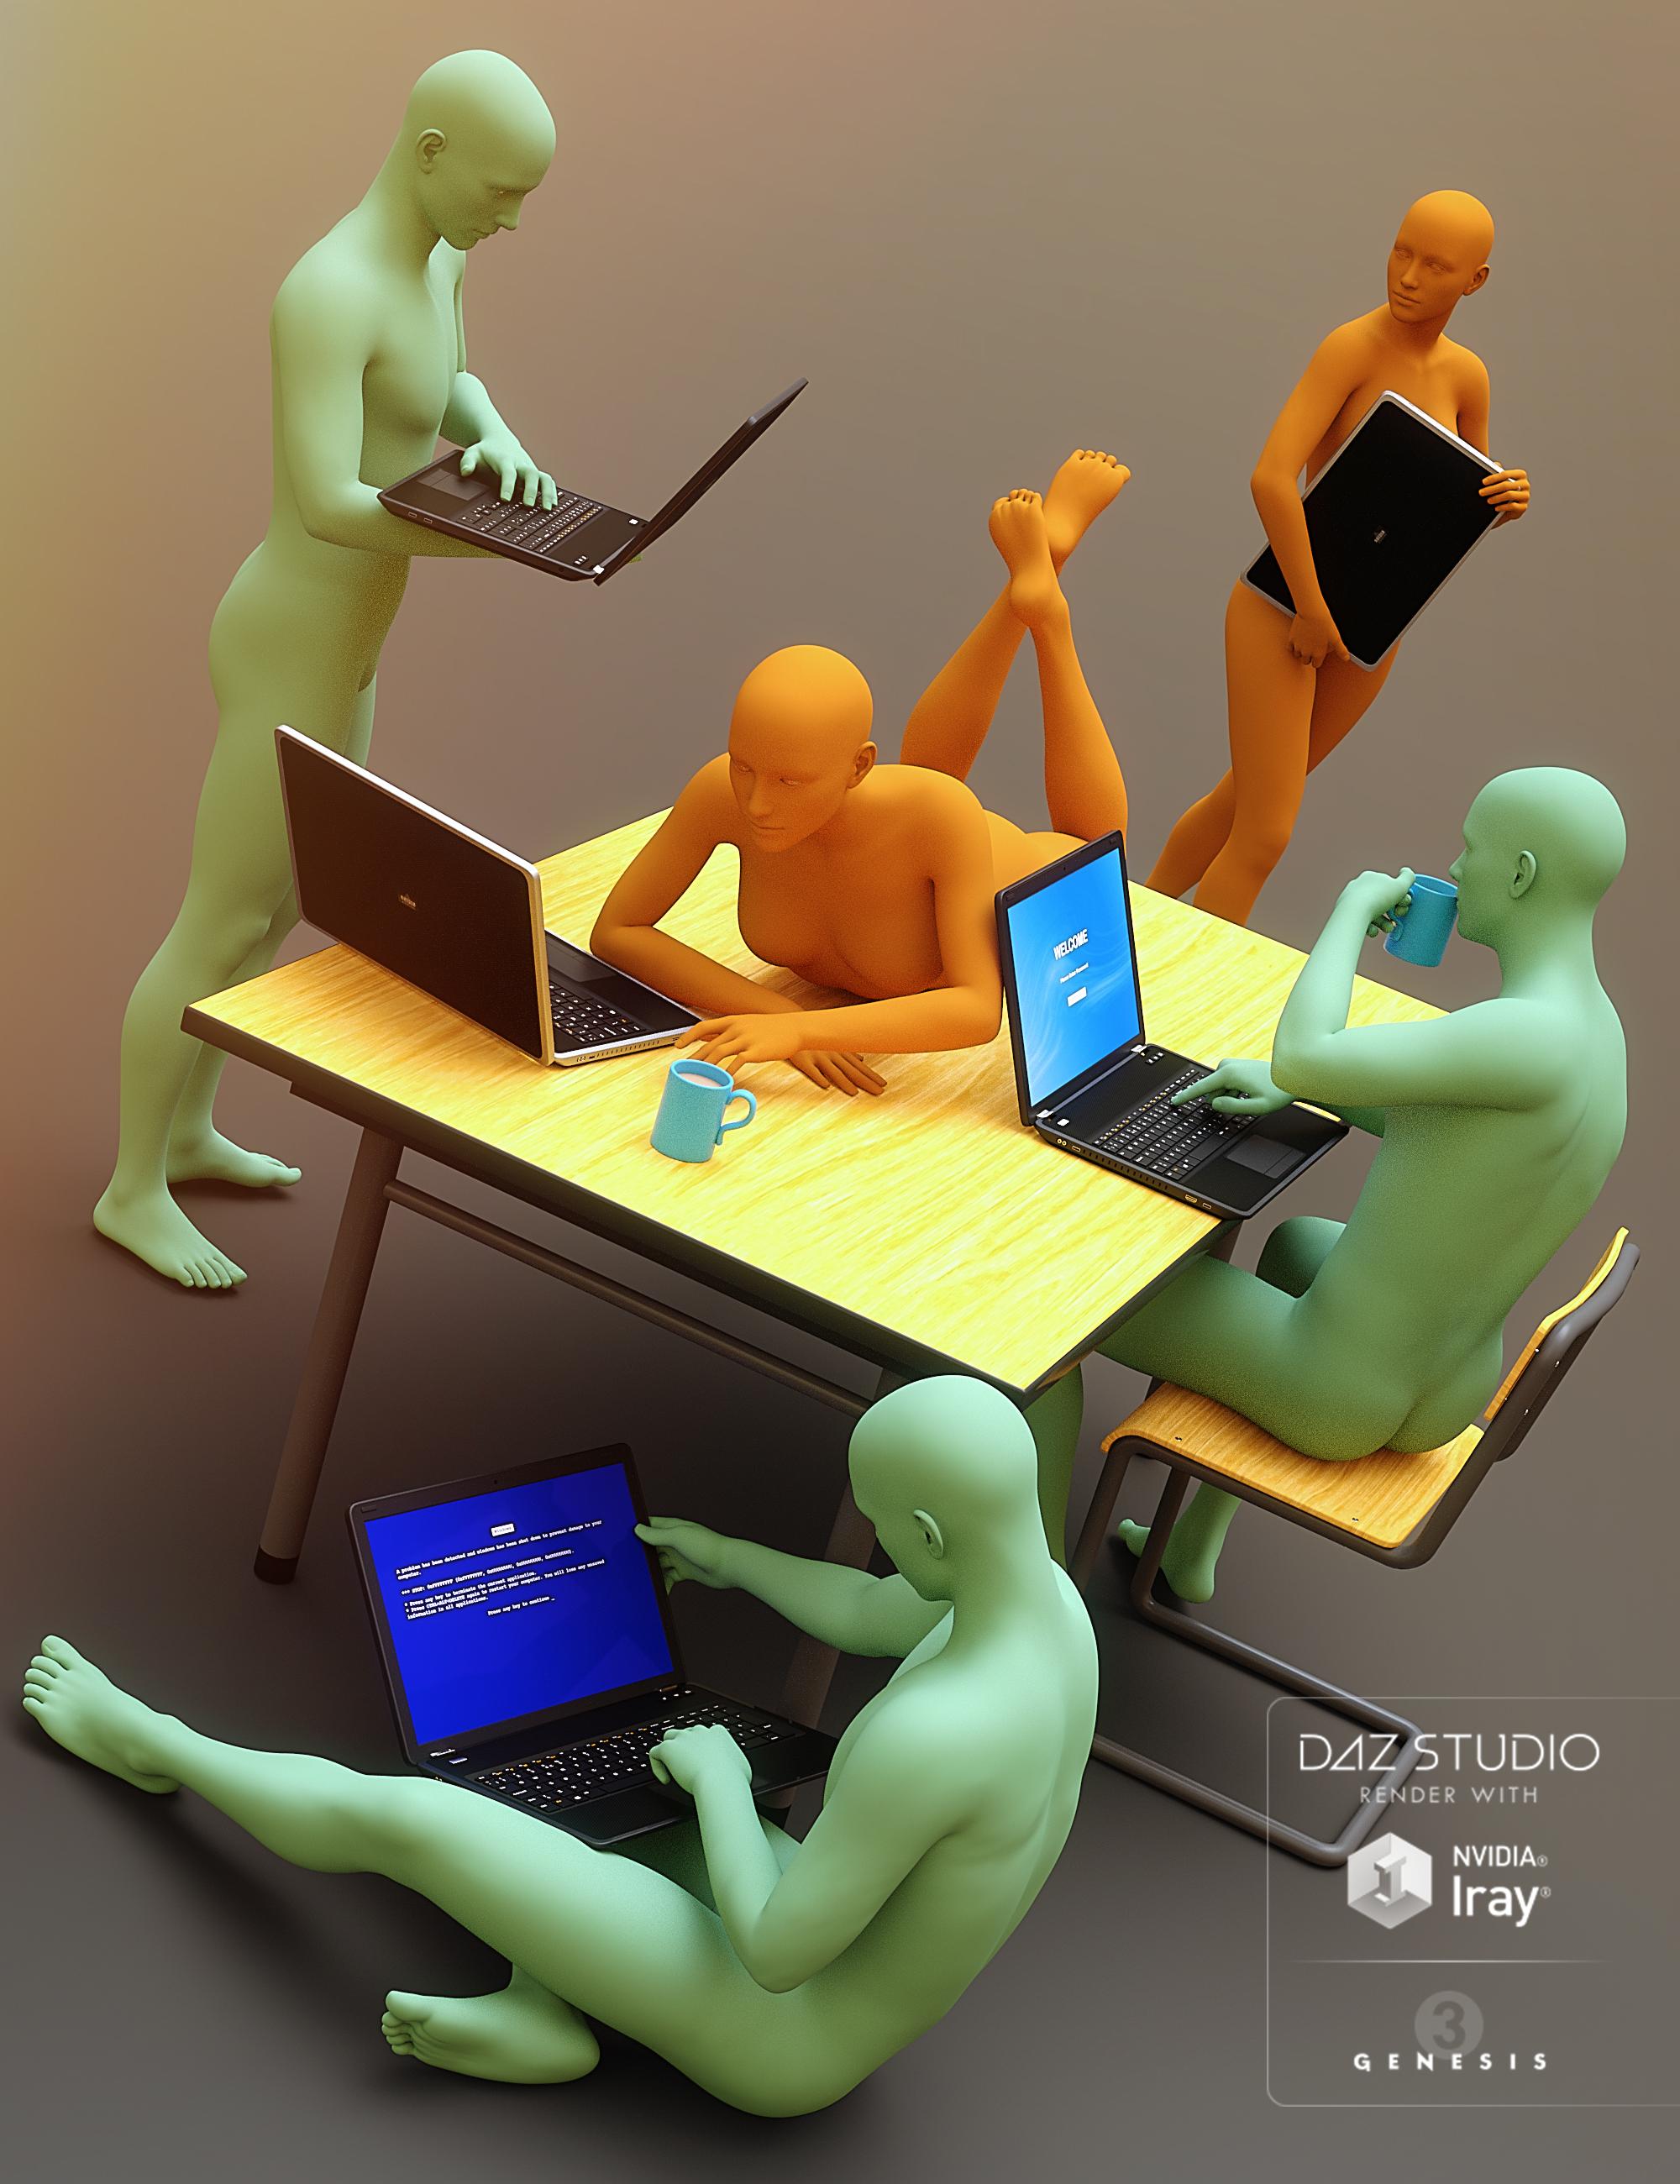 Laptop Poses for Genesis 3 by: Predatron, 3D Models by Daz 3D